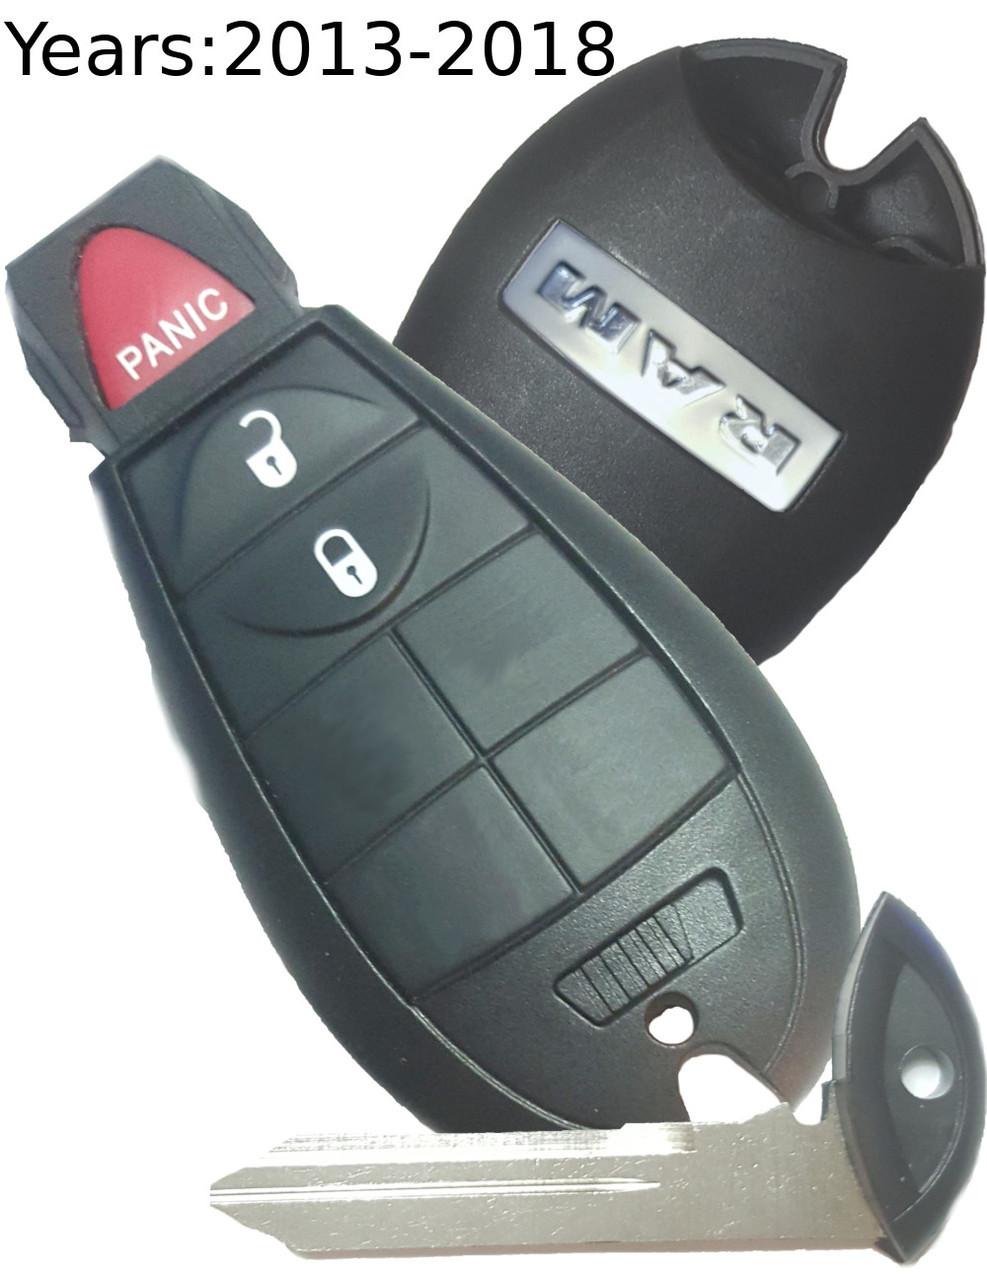 Dodge Ram 1500 2500 3500 4500 5500 Genuine OEM COMPLETE Key Fob Fobik  smartkey 2013-2017